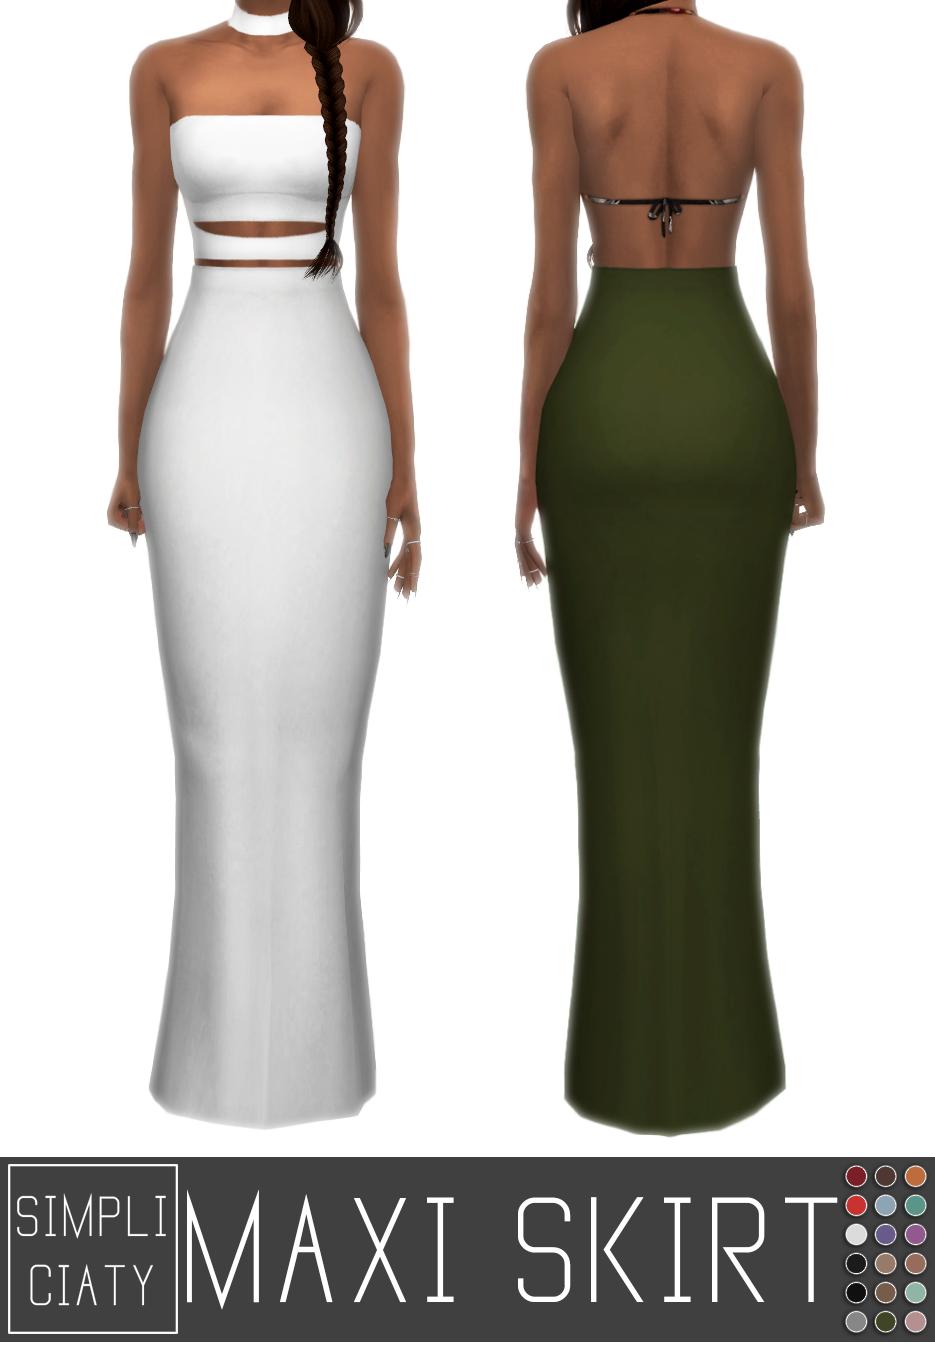 Maxi Skirt Simpliciaty